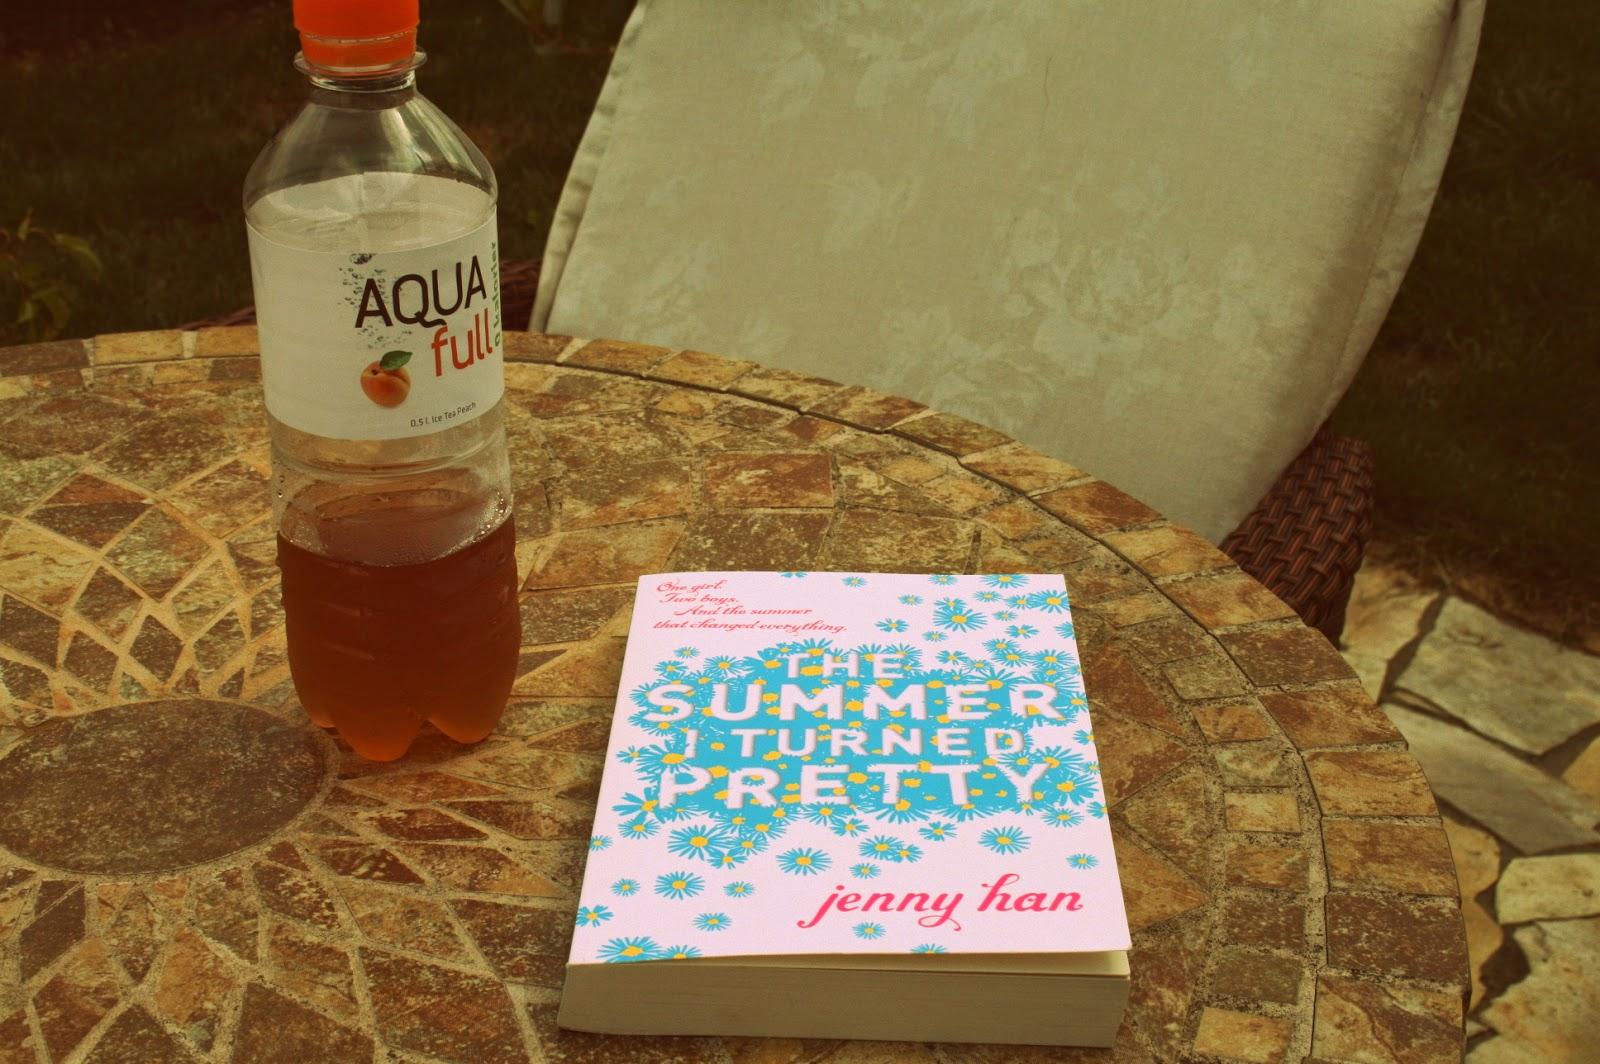 The summer I turned pretty af Jenny Han